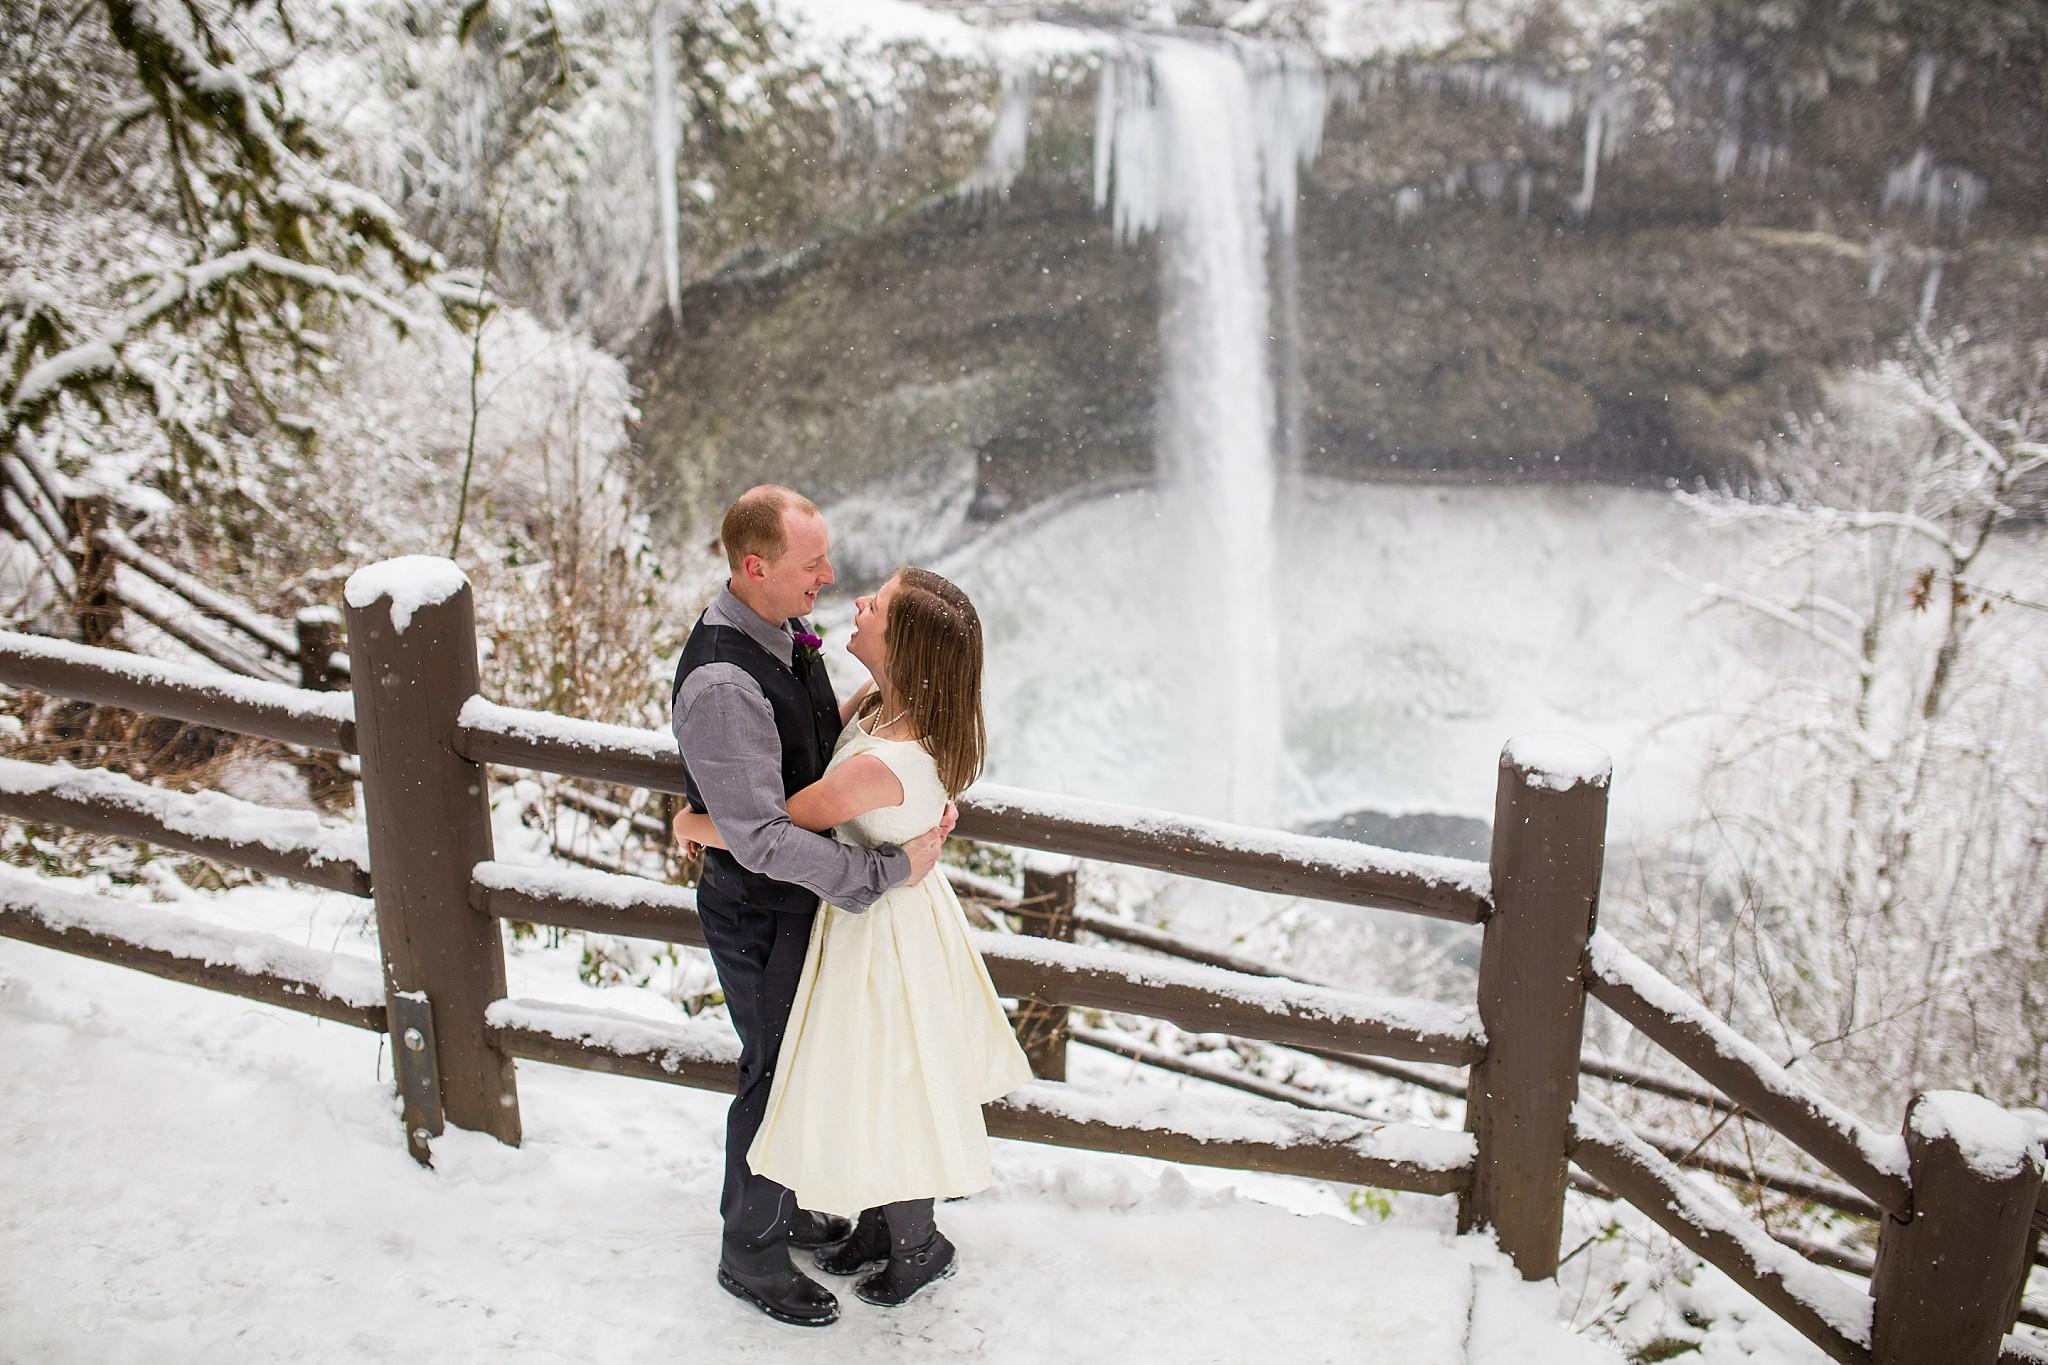 Silver_Falls_Wedding_Photographer_016.jpg